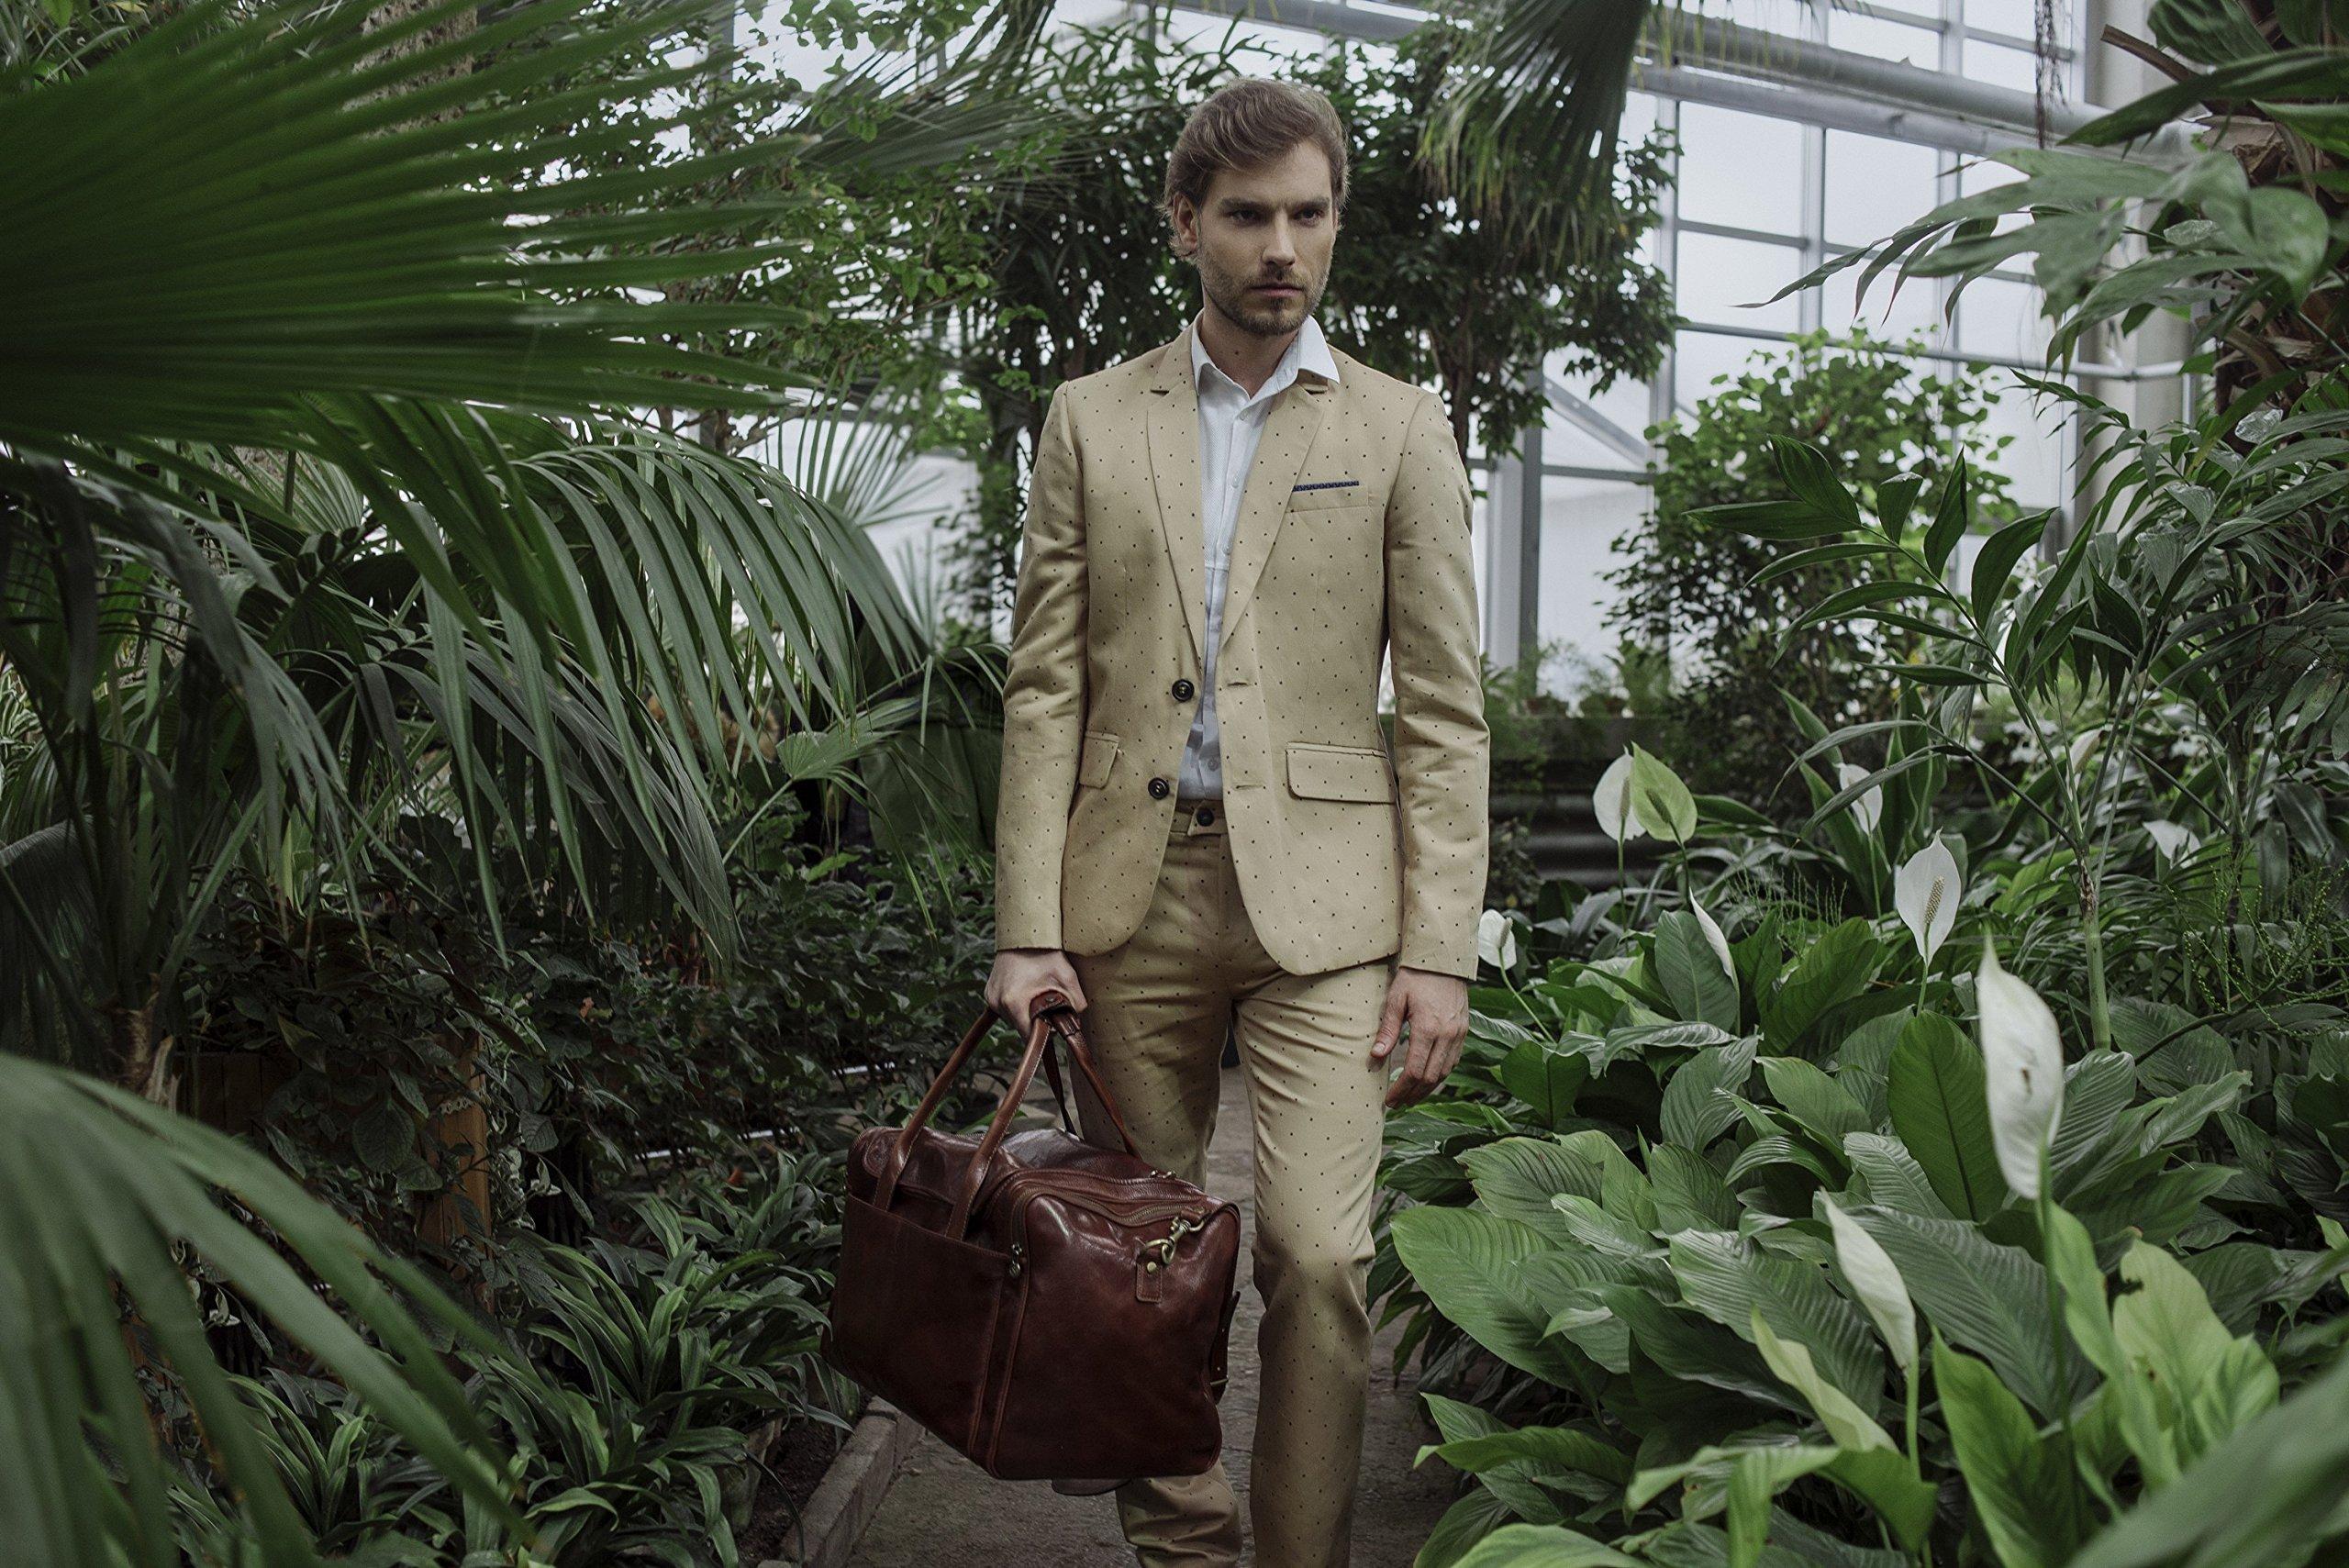 Leather Duffel Bag, Weekend Bag, Gym, Large Travel Bag, Cognac, Brown - Time Resistance by Time Resistance (Image #8)